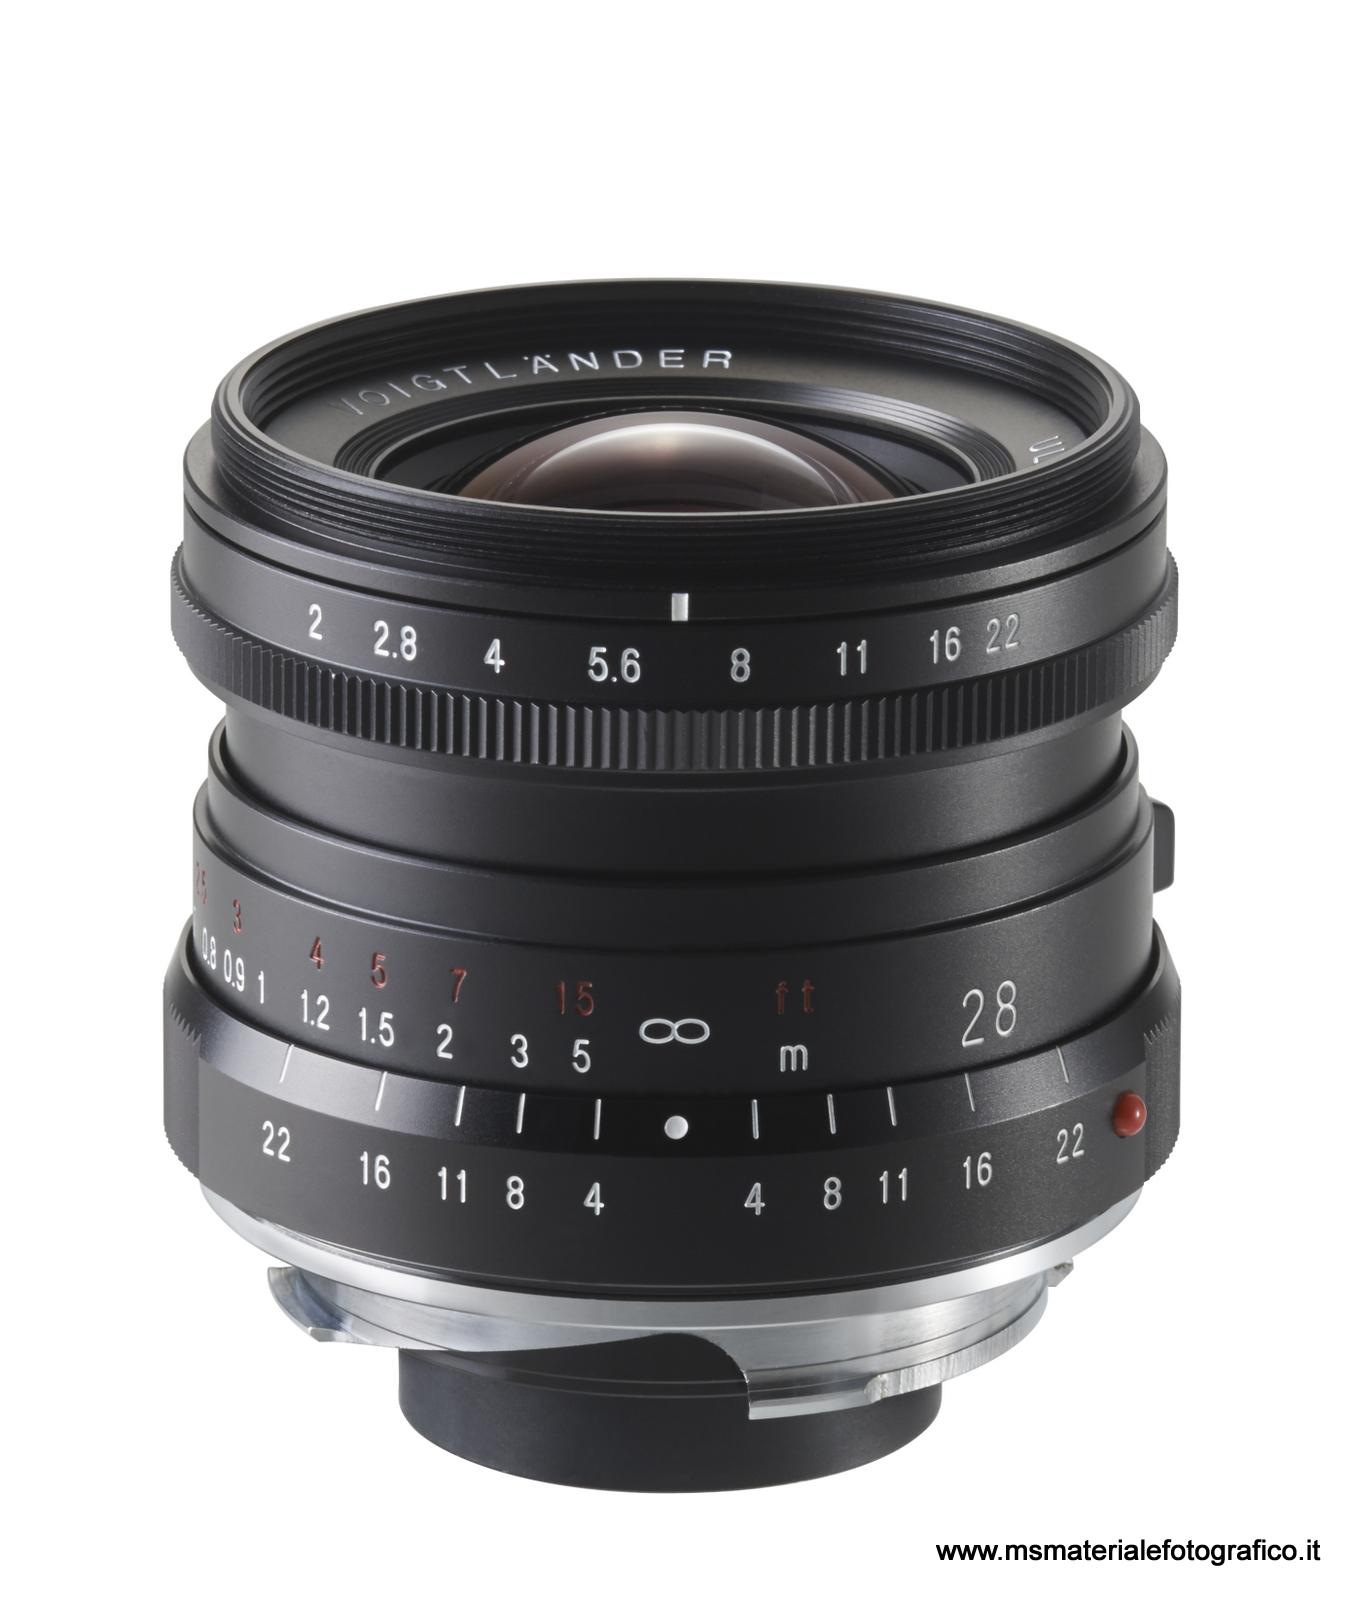 Obiettivo Voigtlander Ultron 28 mm/F2.0